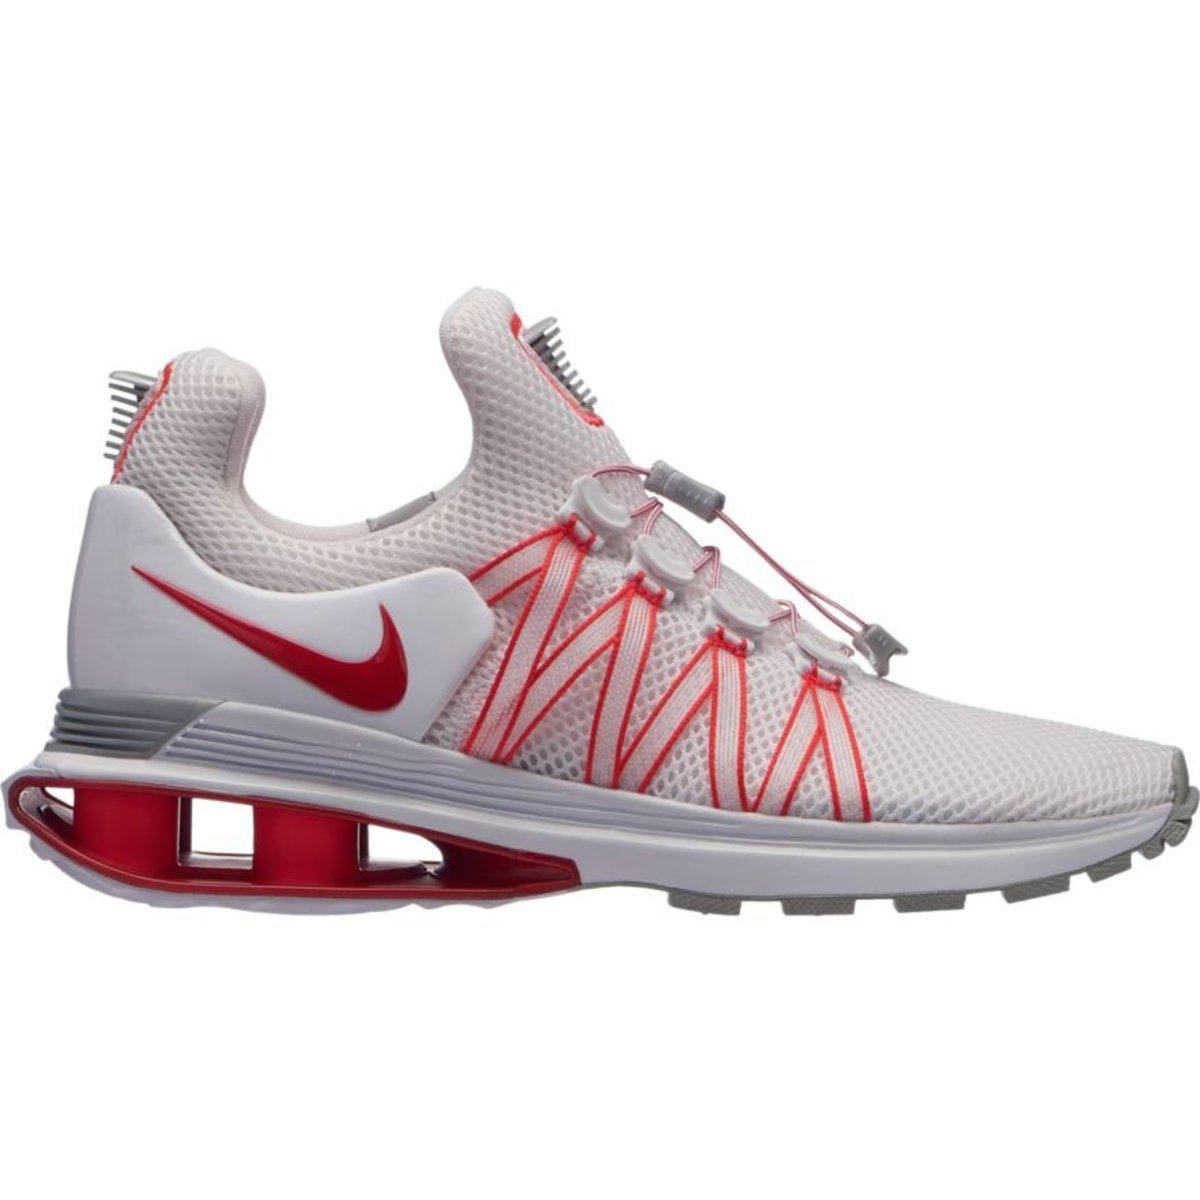 Lyst - Nike Shox Gravity Running Shoes e1a98dbb1